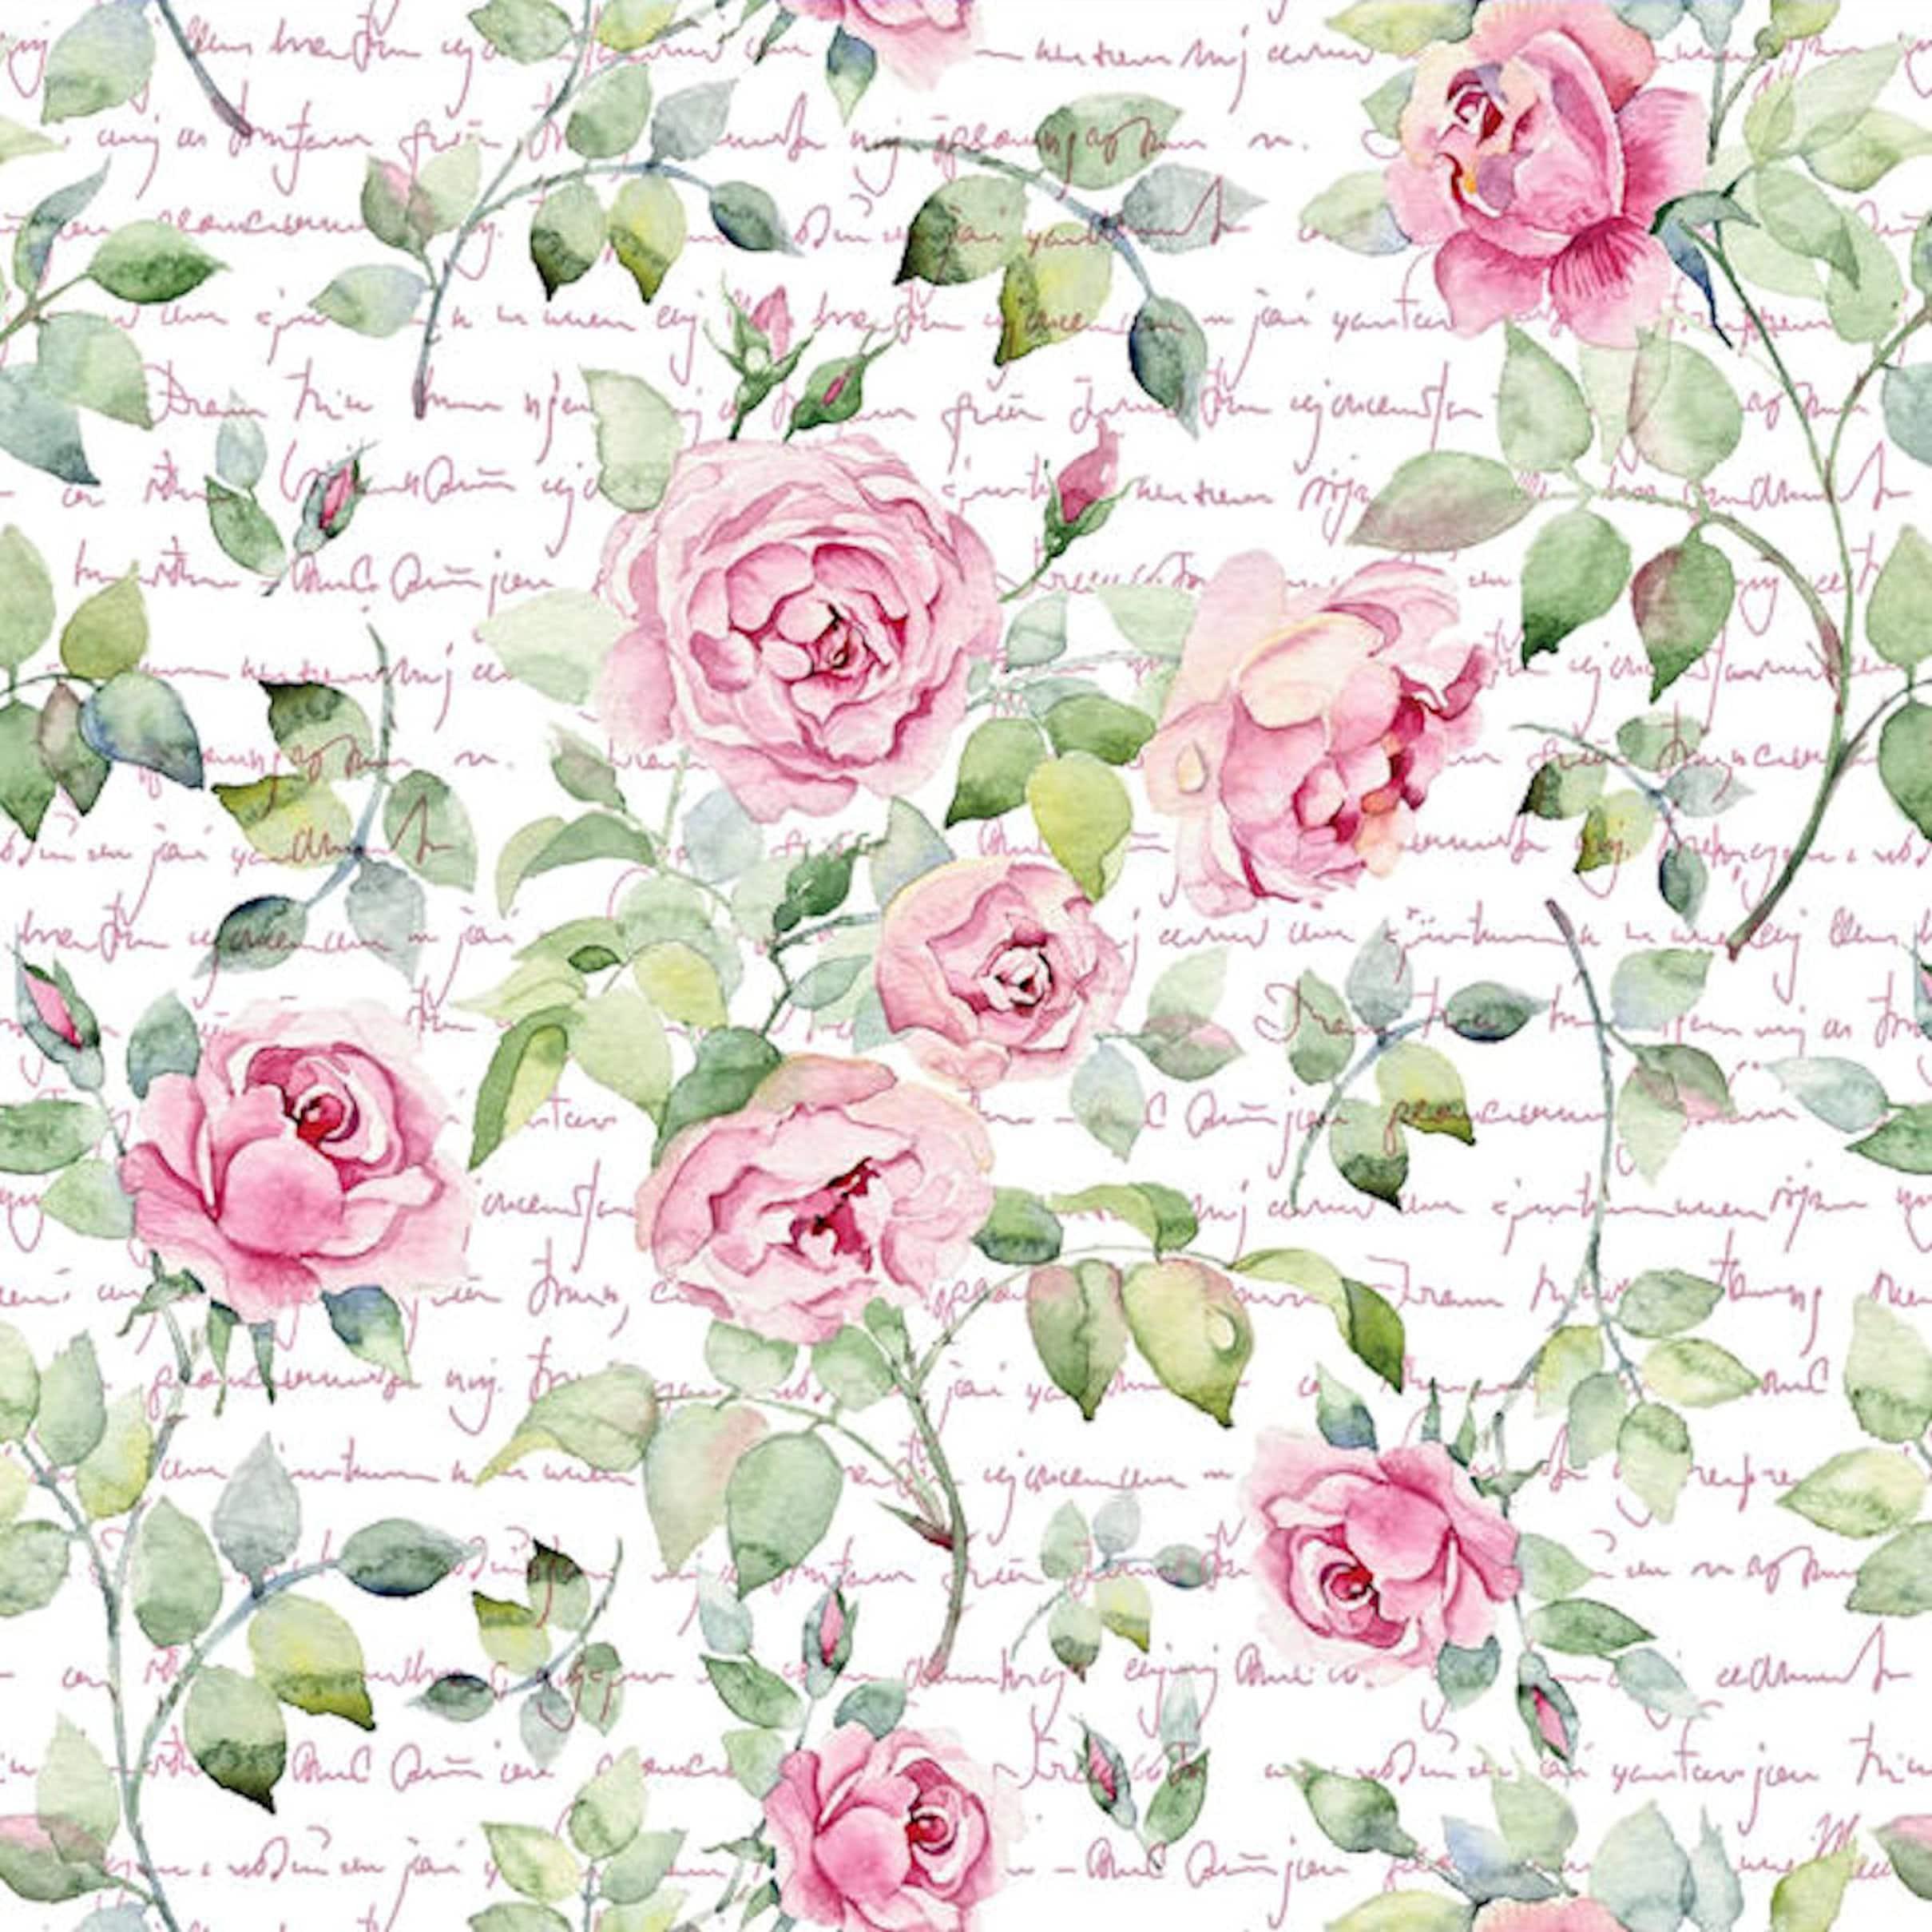 Dollhouse Miniature Shabby Chic Wallpaper Roses Victorian Etsy